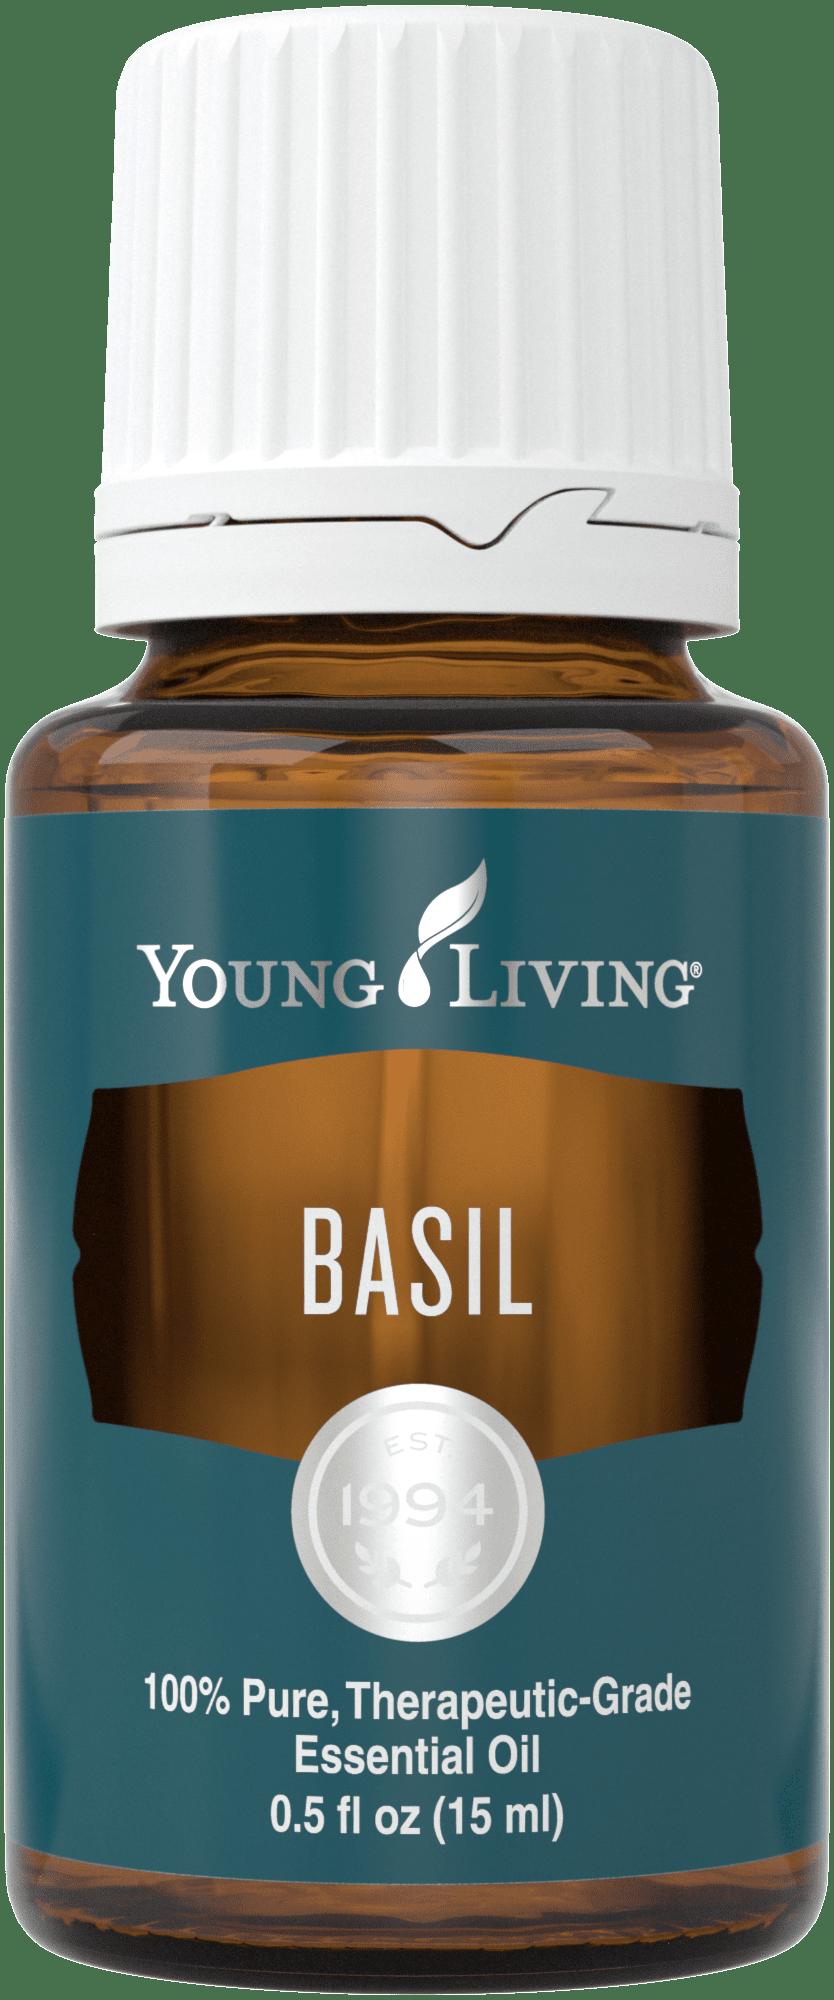 Ätherisches Öl Young Living: Basil (Basilikum) 15ml